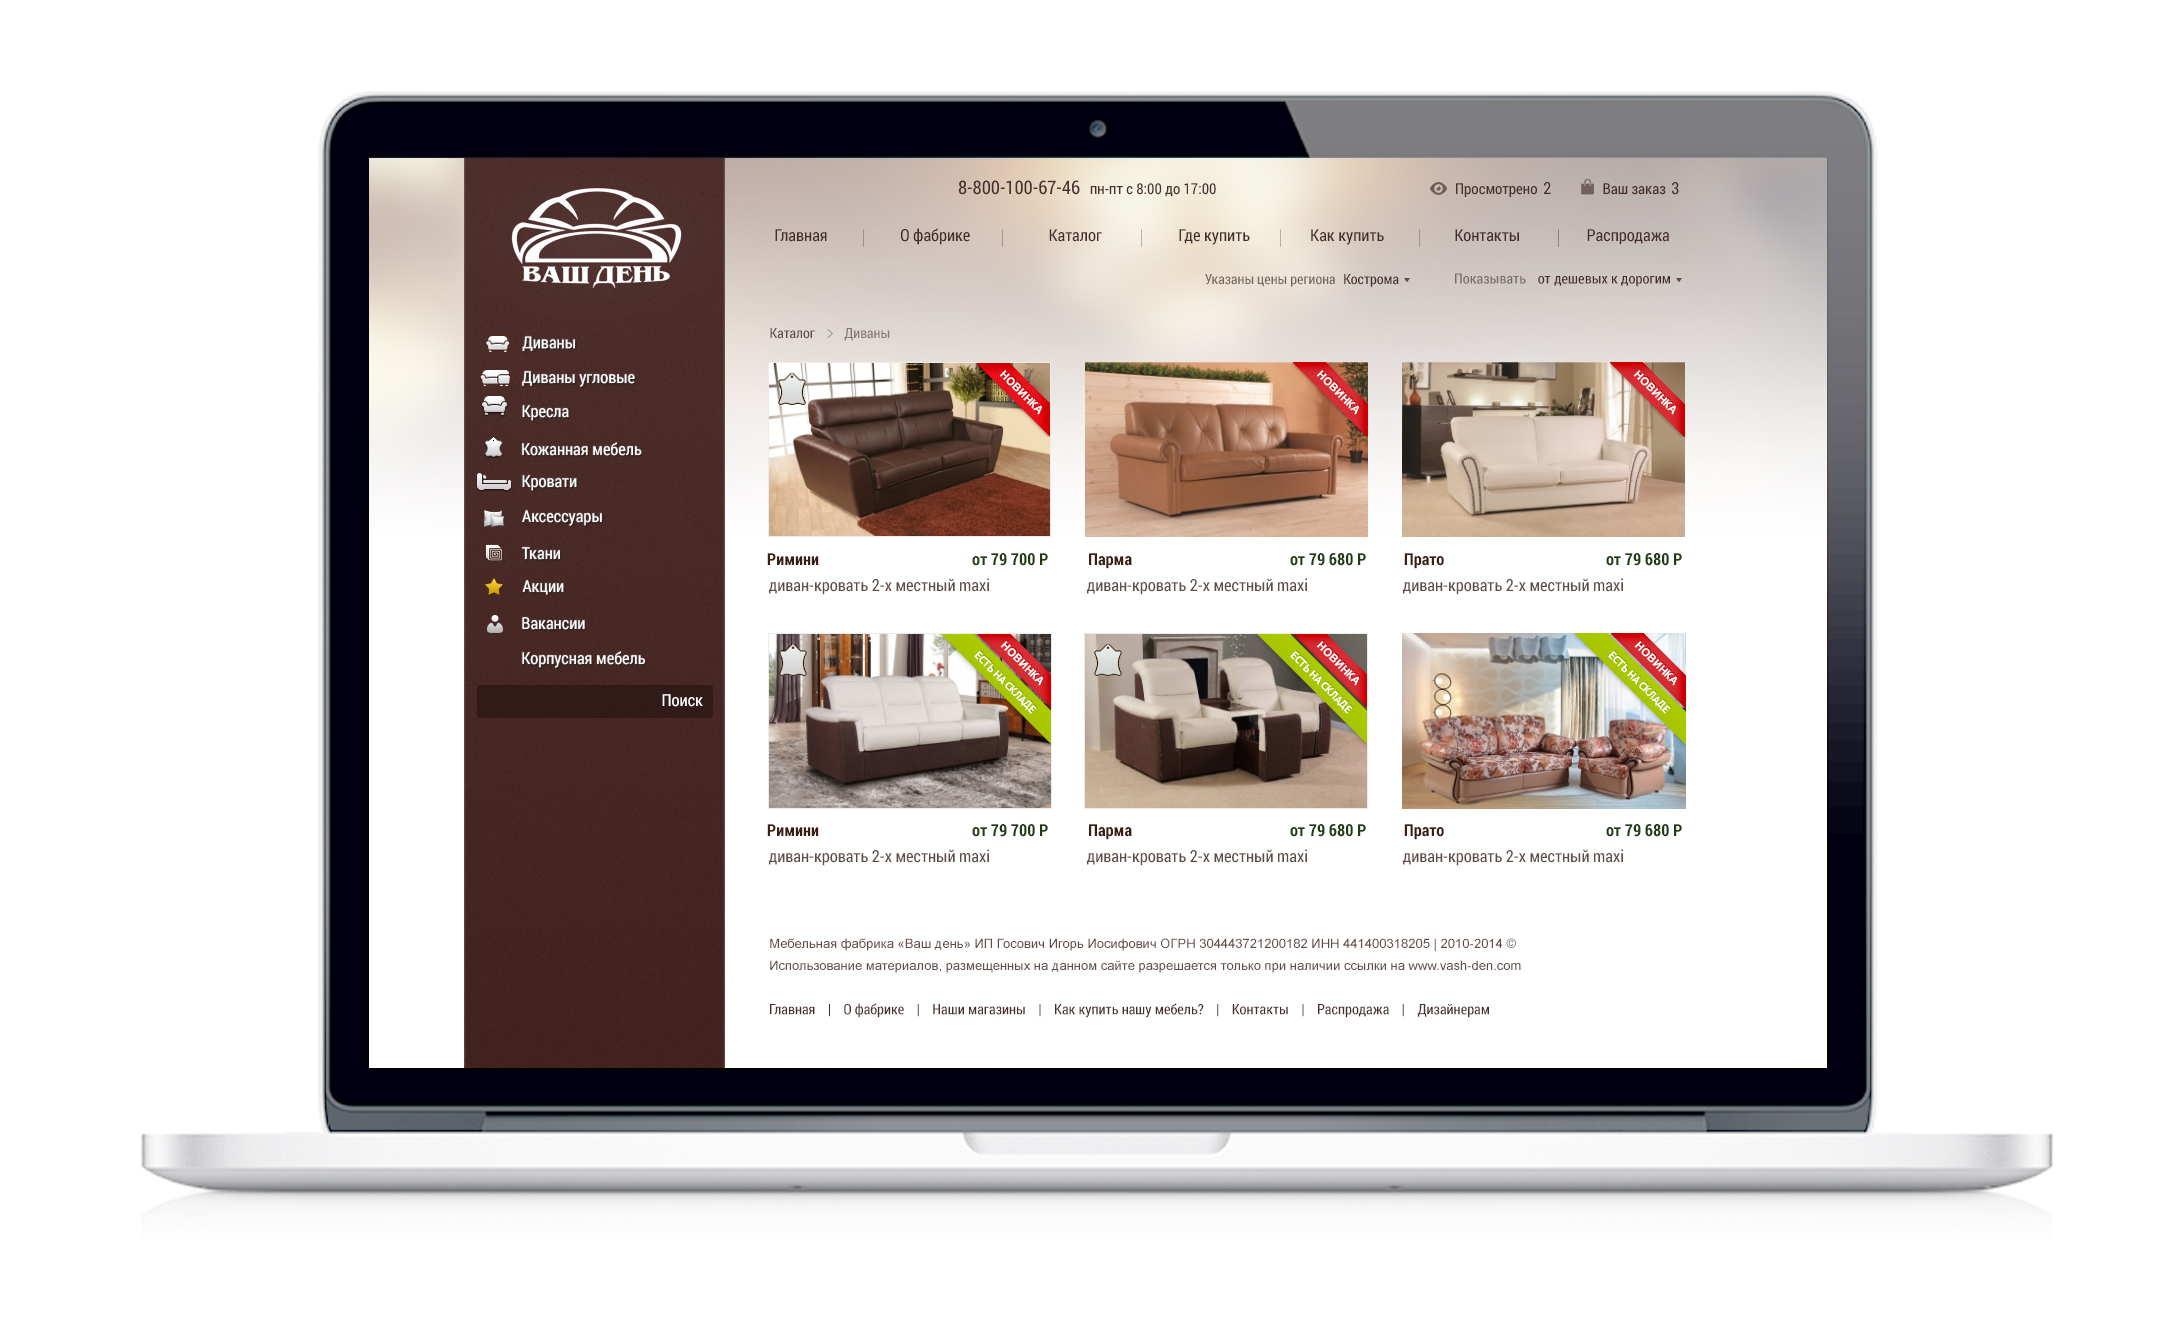 Разработать дизайн для интернет-магазина мебели фото f_94252e67cc30d1e0.jpg